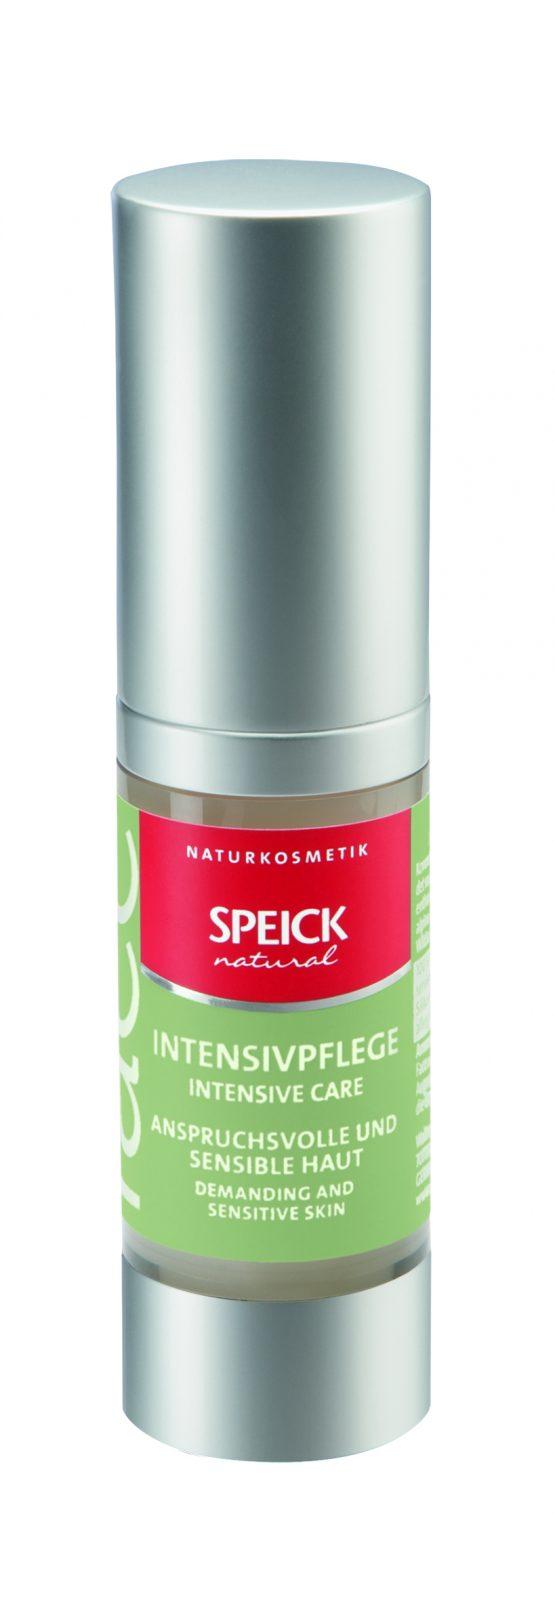 speick_nf-serum_300dpi